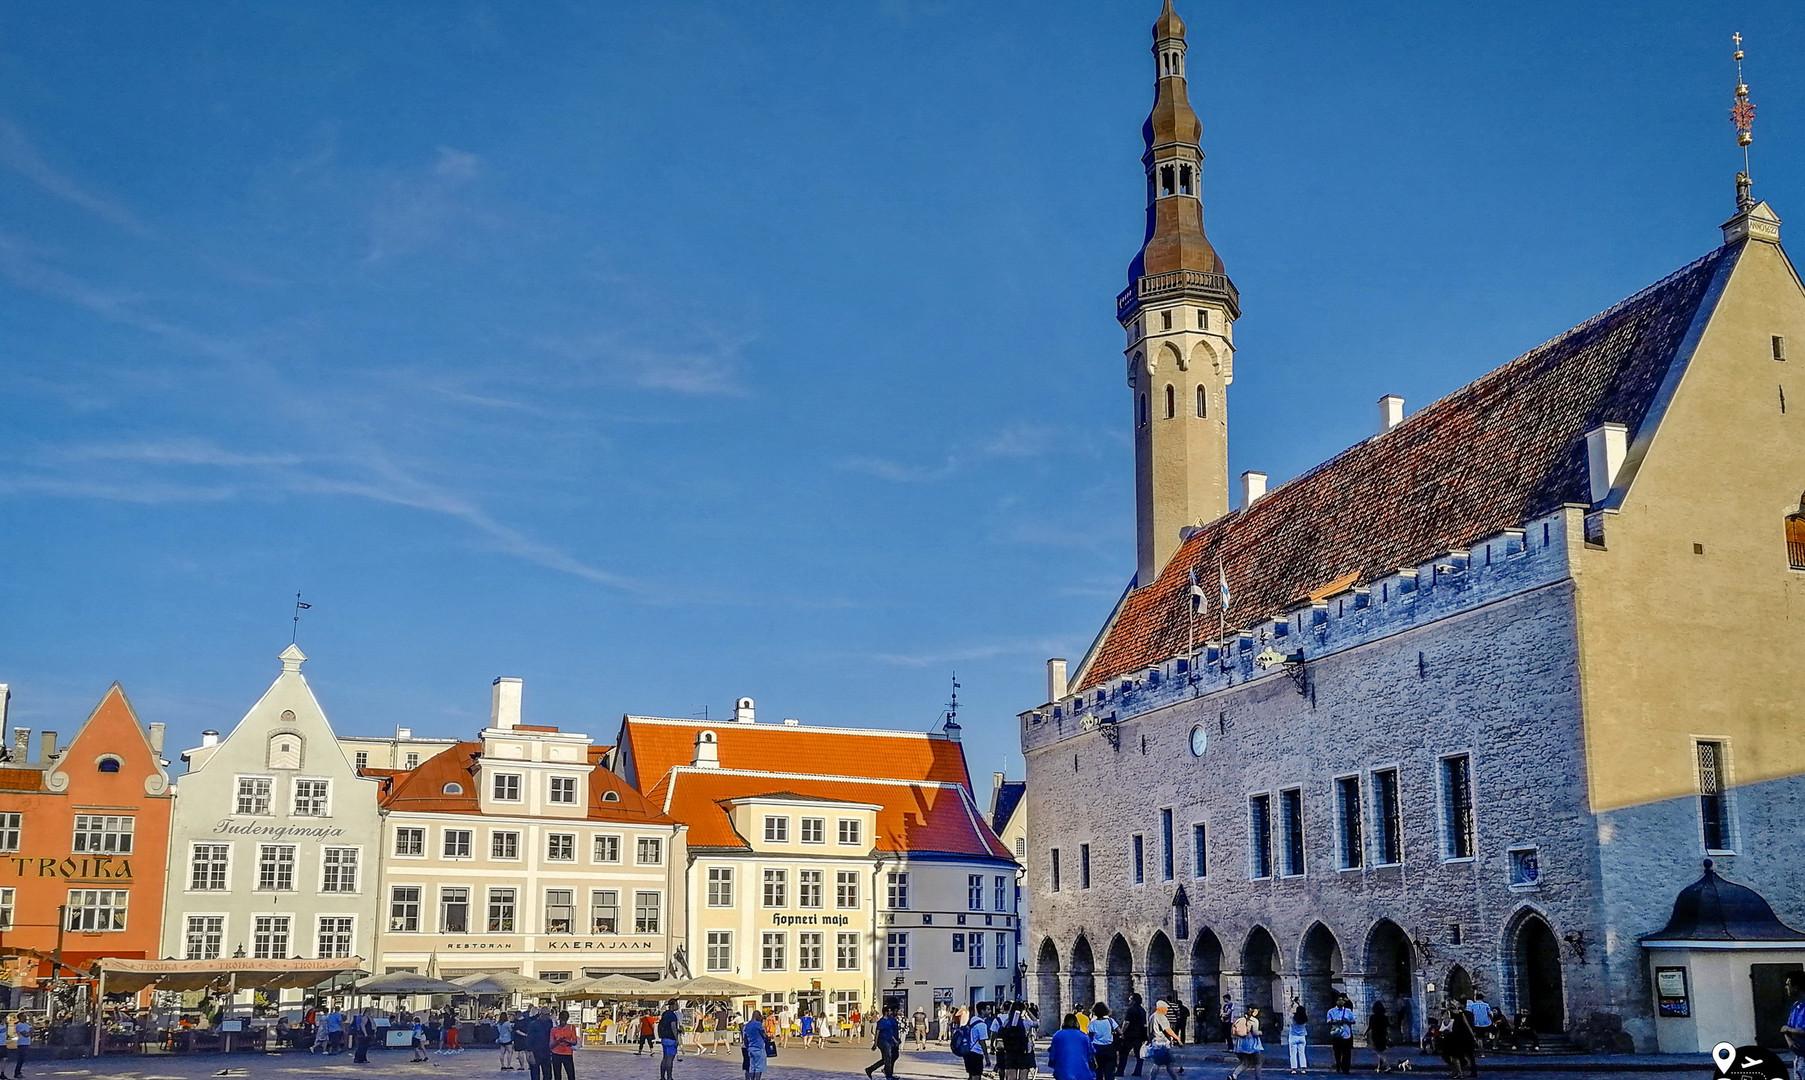 Ратушная площадь, Таллин